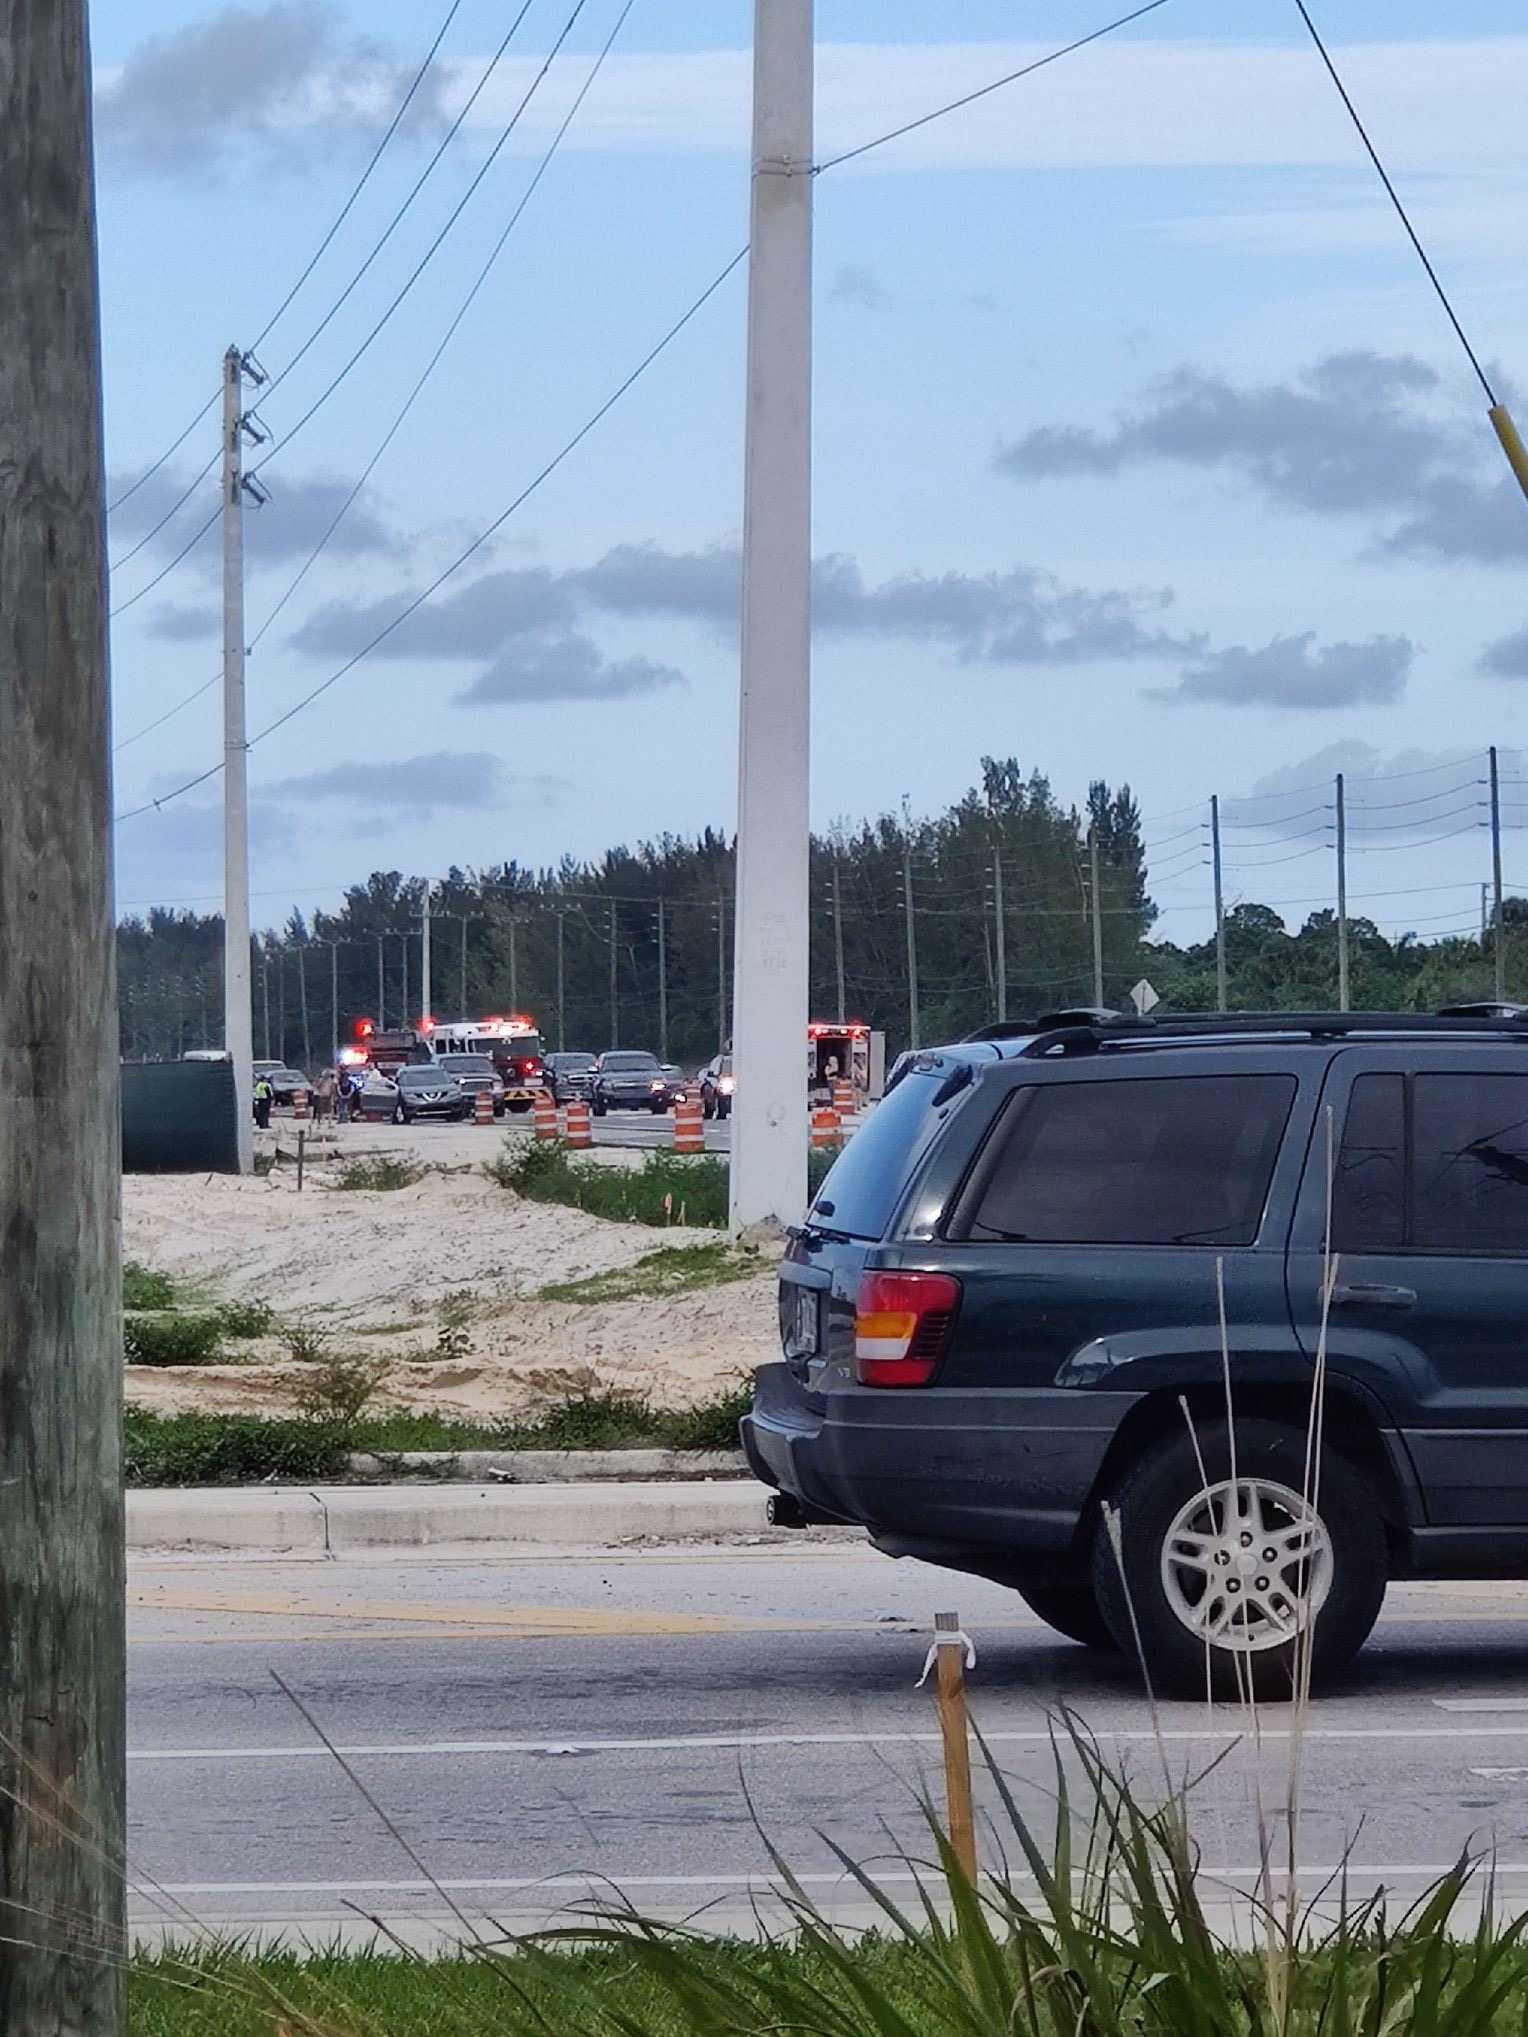 Two car accident slows traffic near West Palm Beach